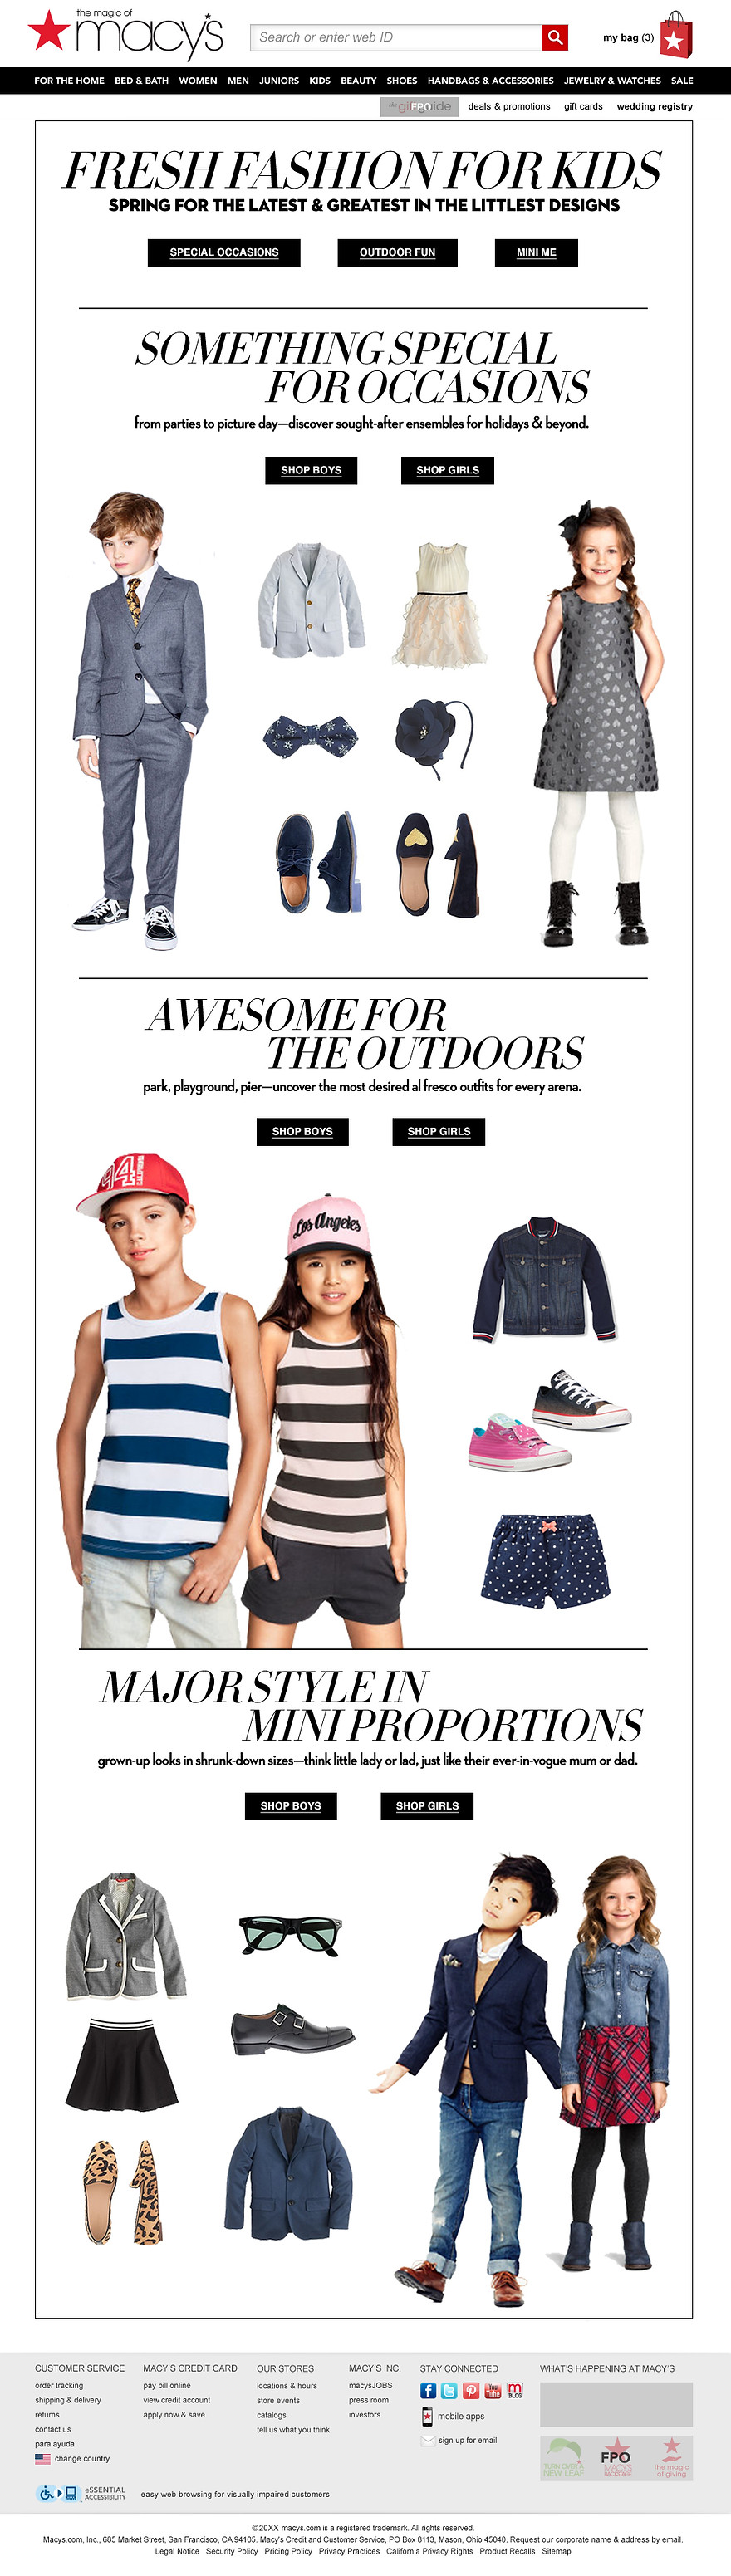 Kids_Spring_trends_16_Dt1.jpg